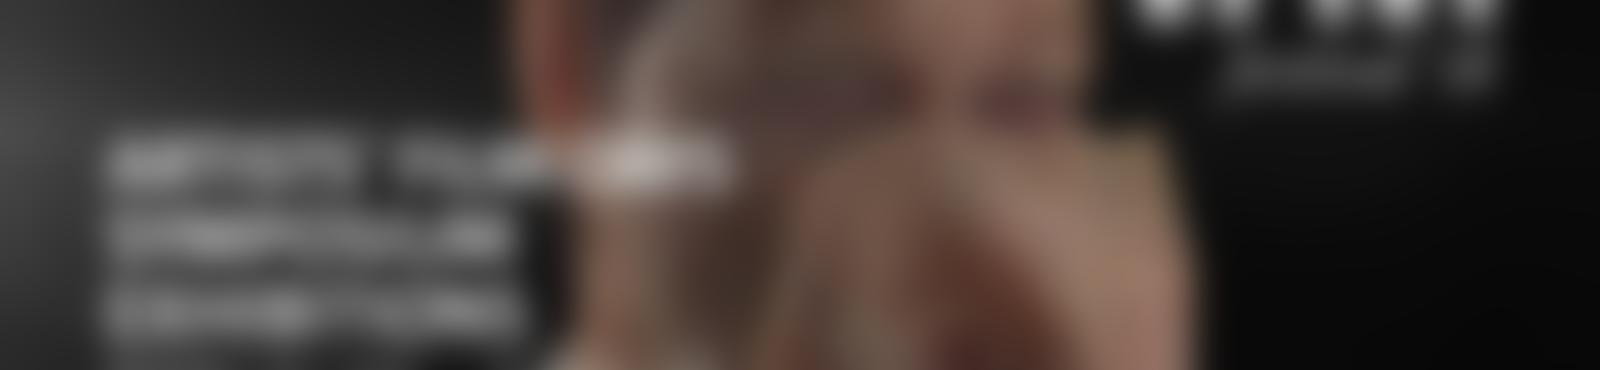 Blurred 2061e3c8 302a 4bcf b9ae d738fb8c508d